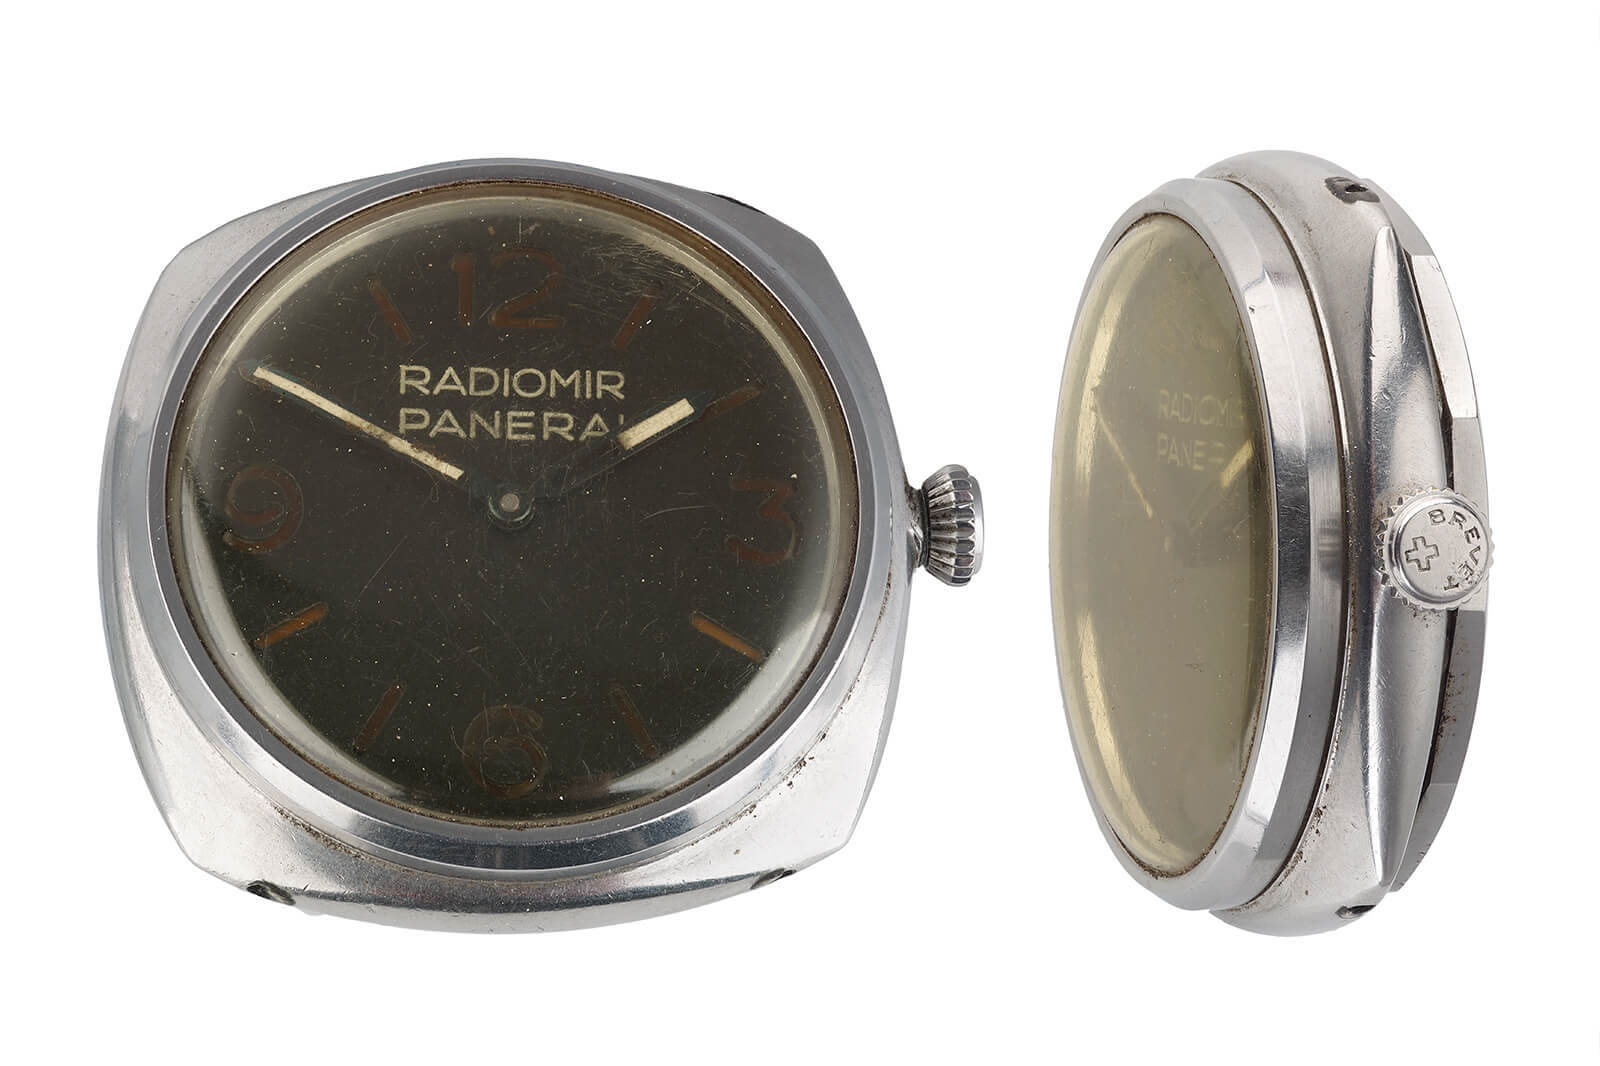 Captain Packer's WW2 Panerai Dive Watch